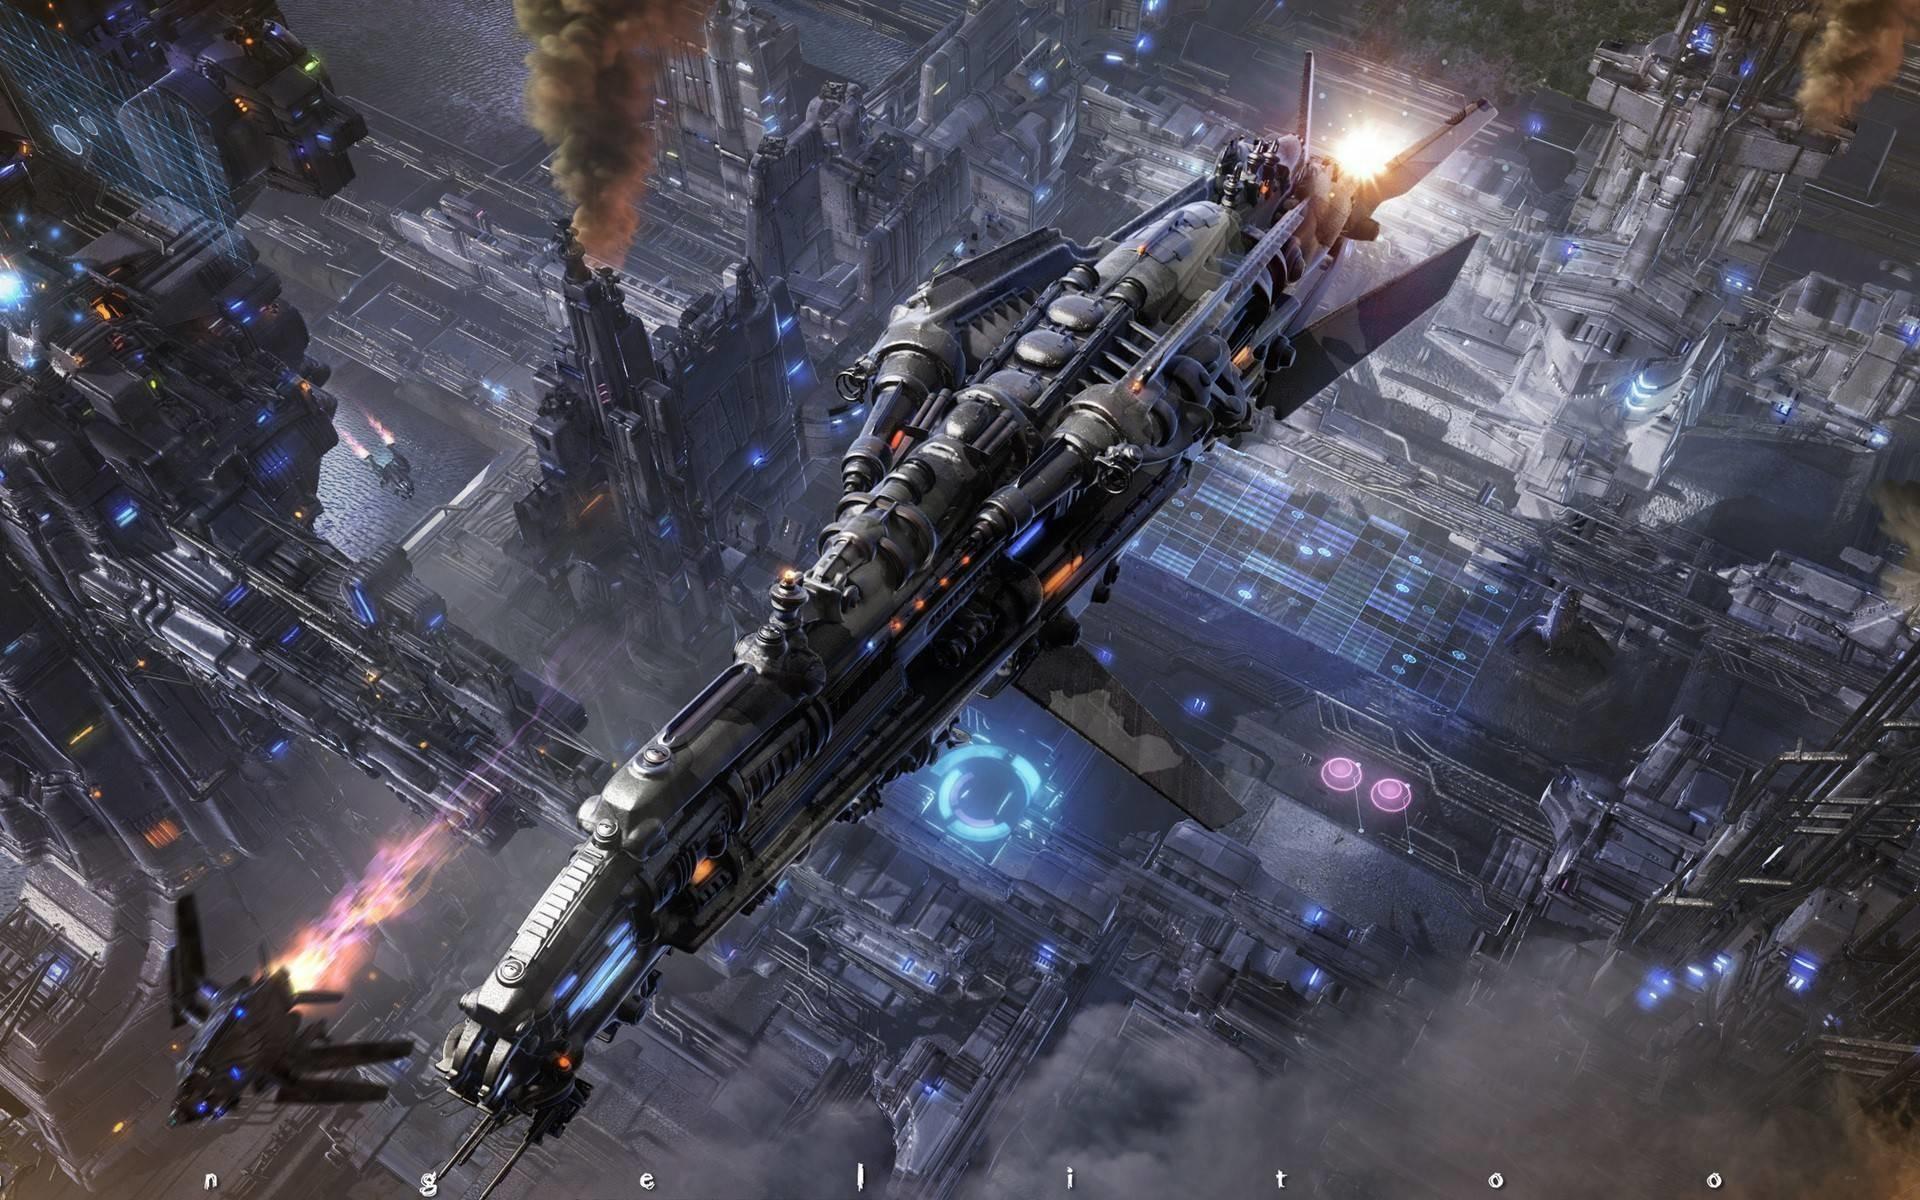 Papel de Parede Sci-Fi – HD Wallpaper para Download no Celular ou .